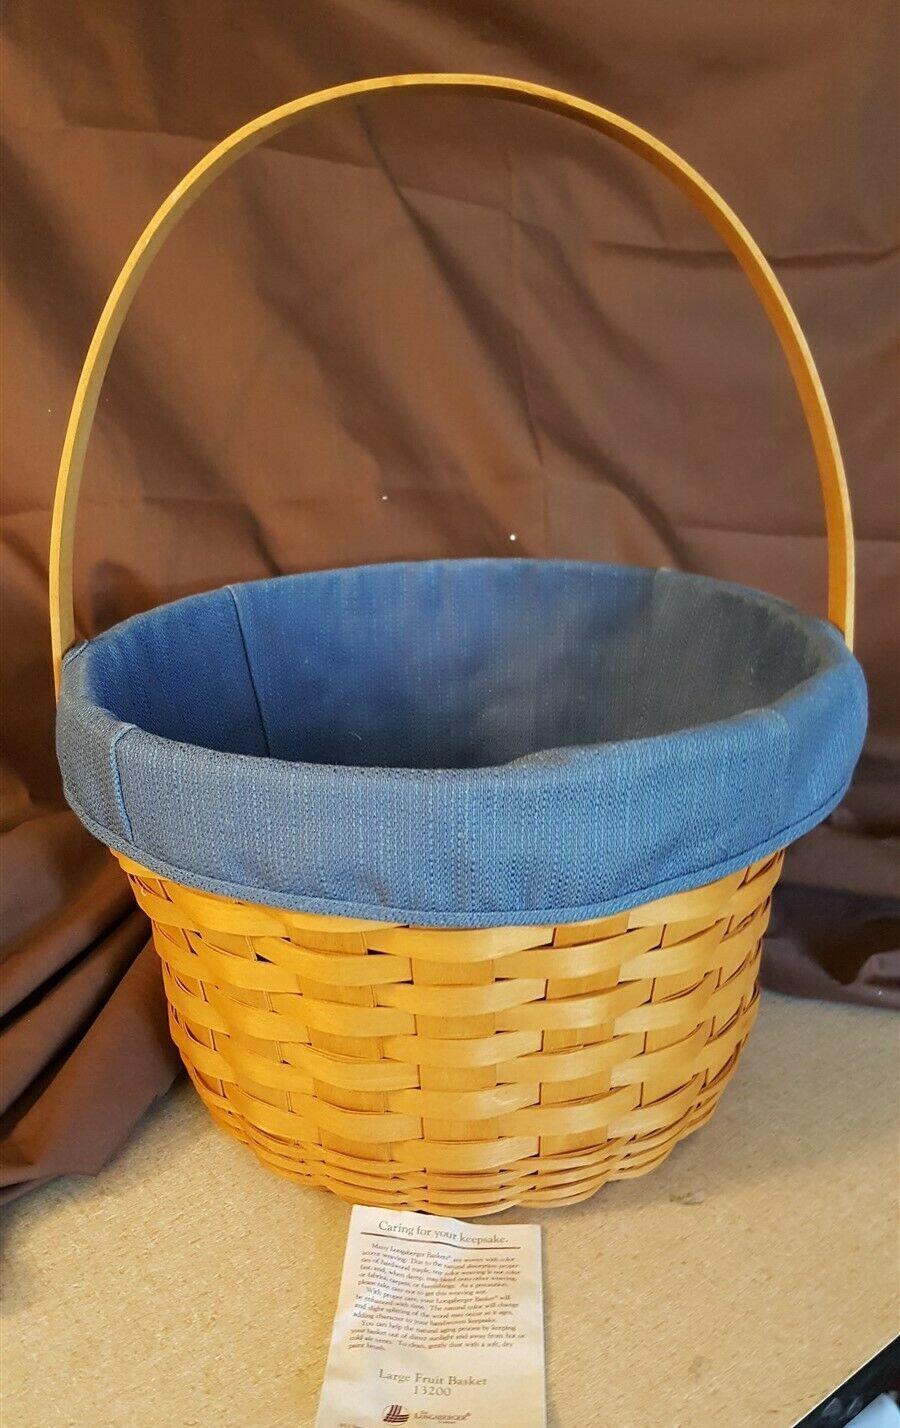 Longaberger 1996 LARGE FRUIT APPLE BASKET #13200 With Blue Fabric Liner